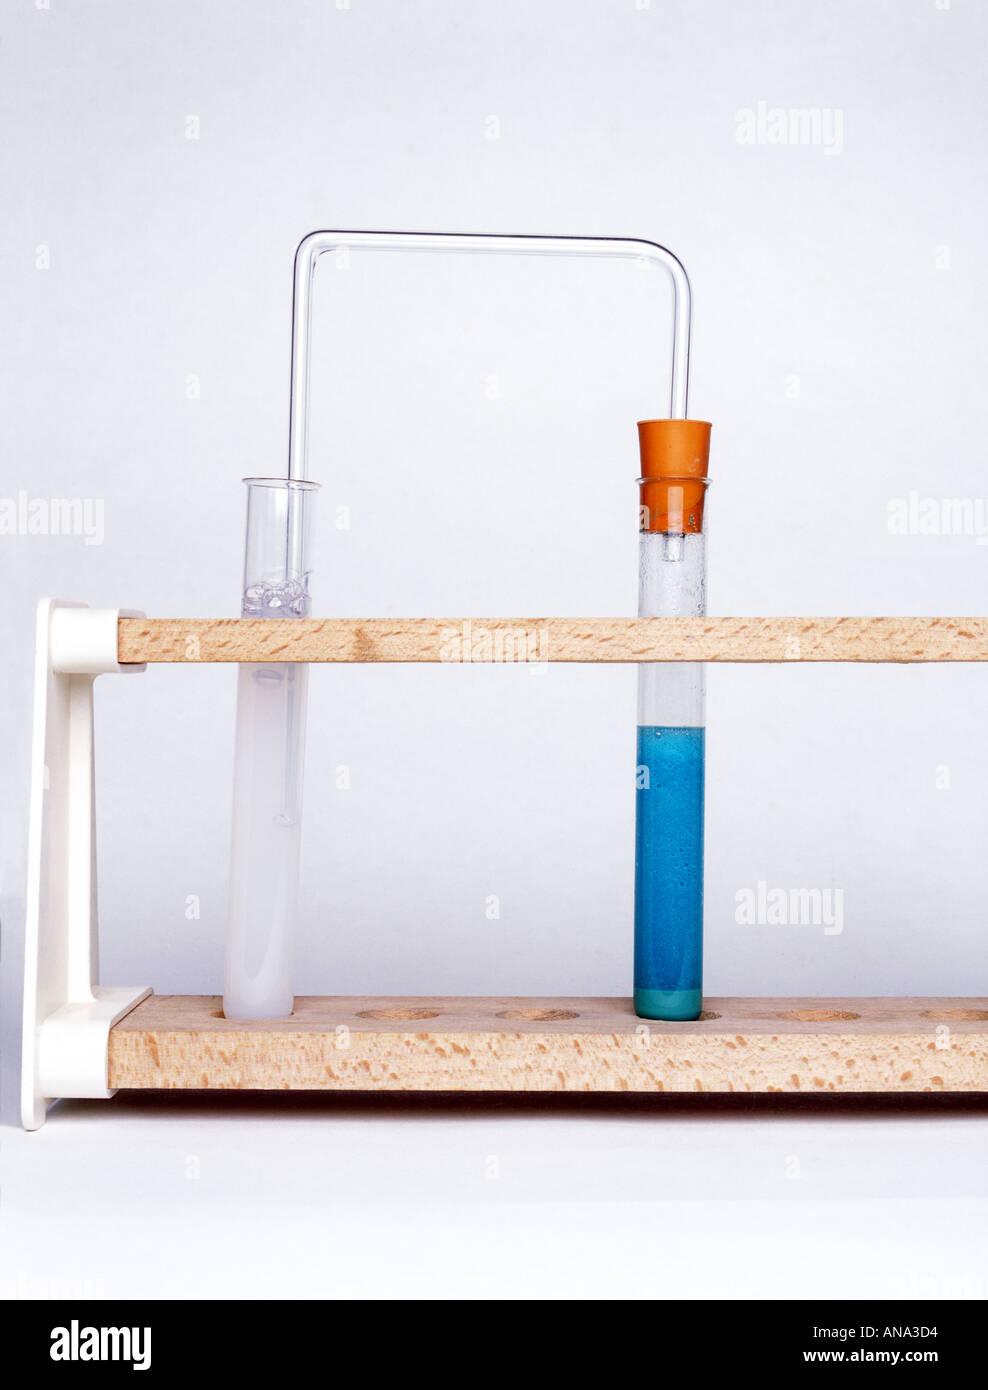 Carbonato de cobre reacciona con el ácido sulfúrico para producir dióxido de carbono que se propaga a través limewater girándolo lechoso Imagen De Stock